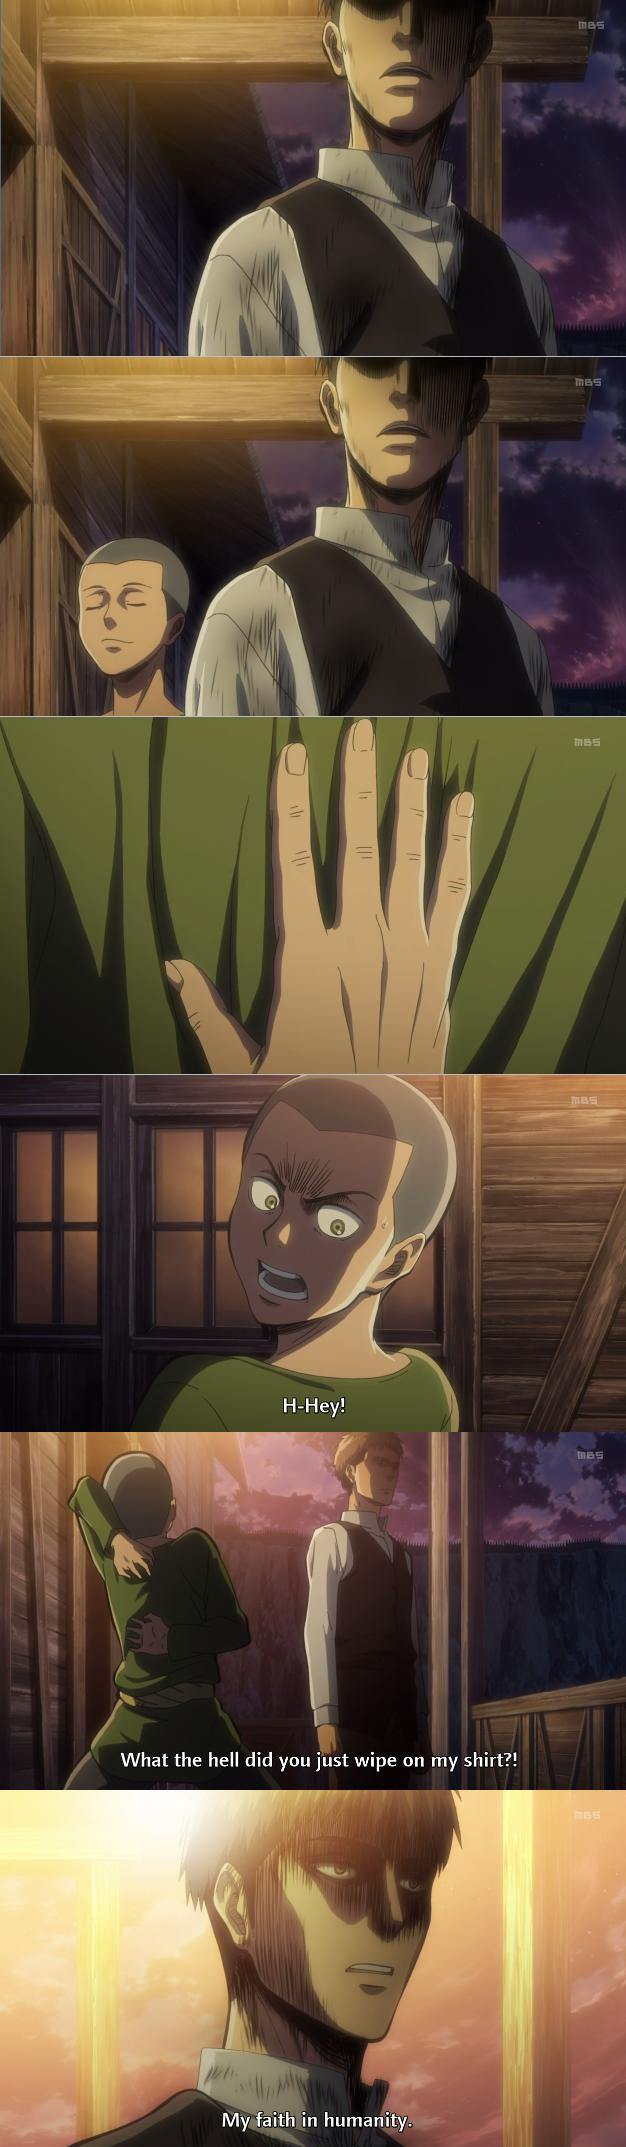 Faith in humaniy LV: Anime. source: Shingoki no kyojin.. This episode. Faith in humaniy LV: Anime source: Shingoki no kyojin This episode